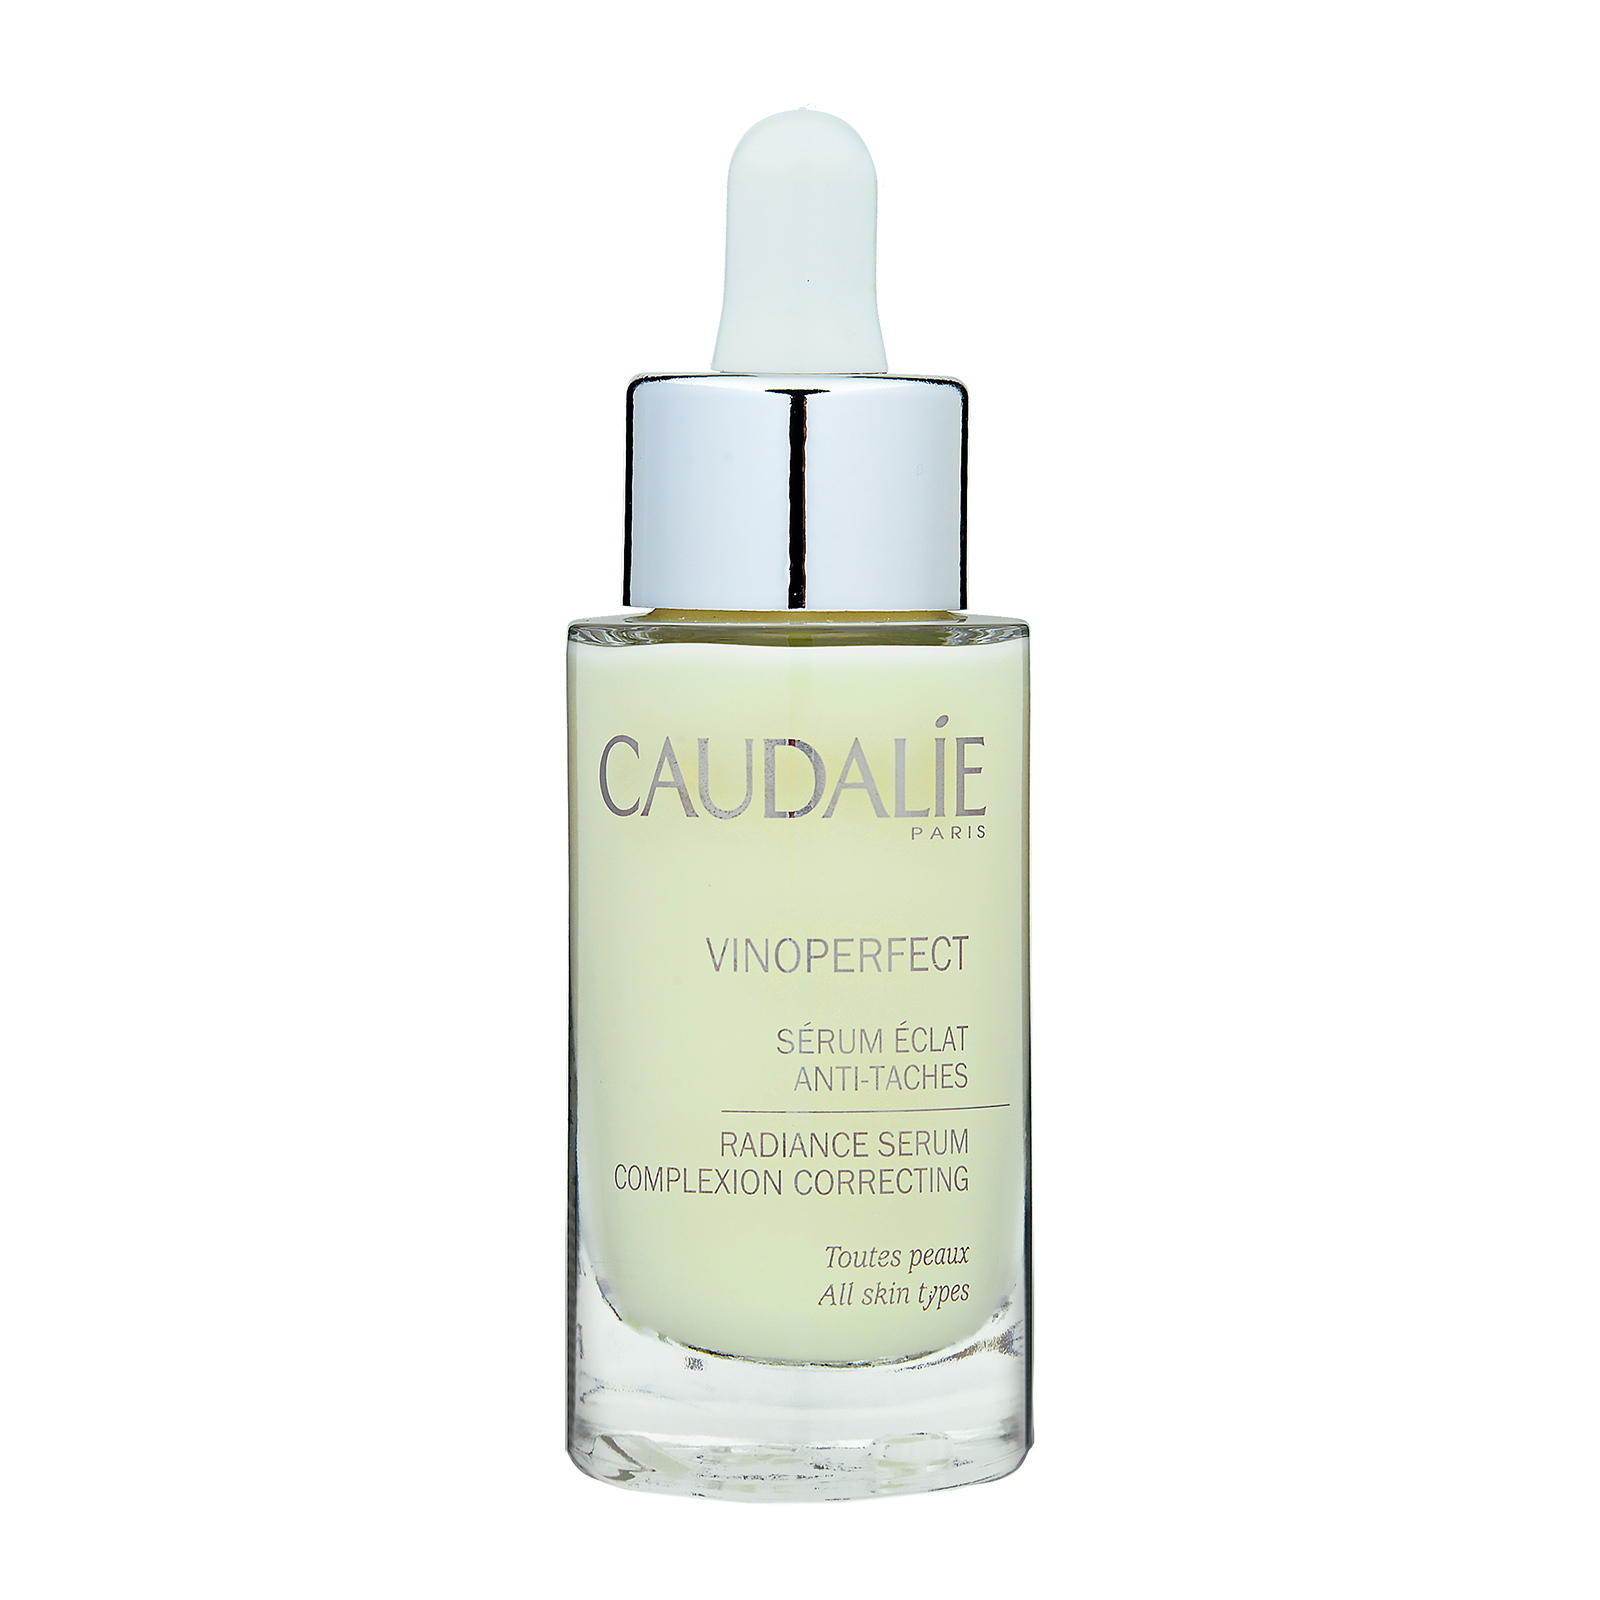 CAUDALIE Vinoperfect Radiance Serum 1oz, 30ml